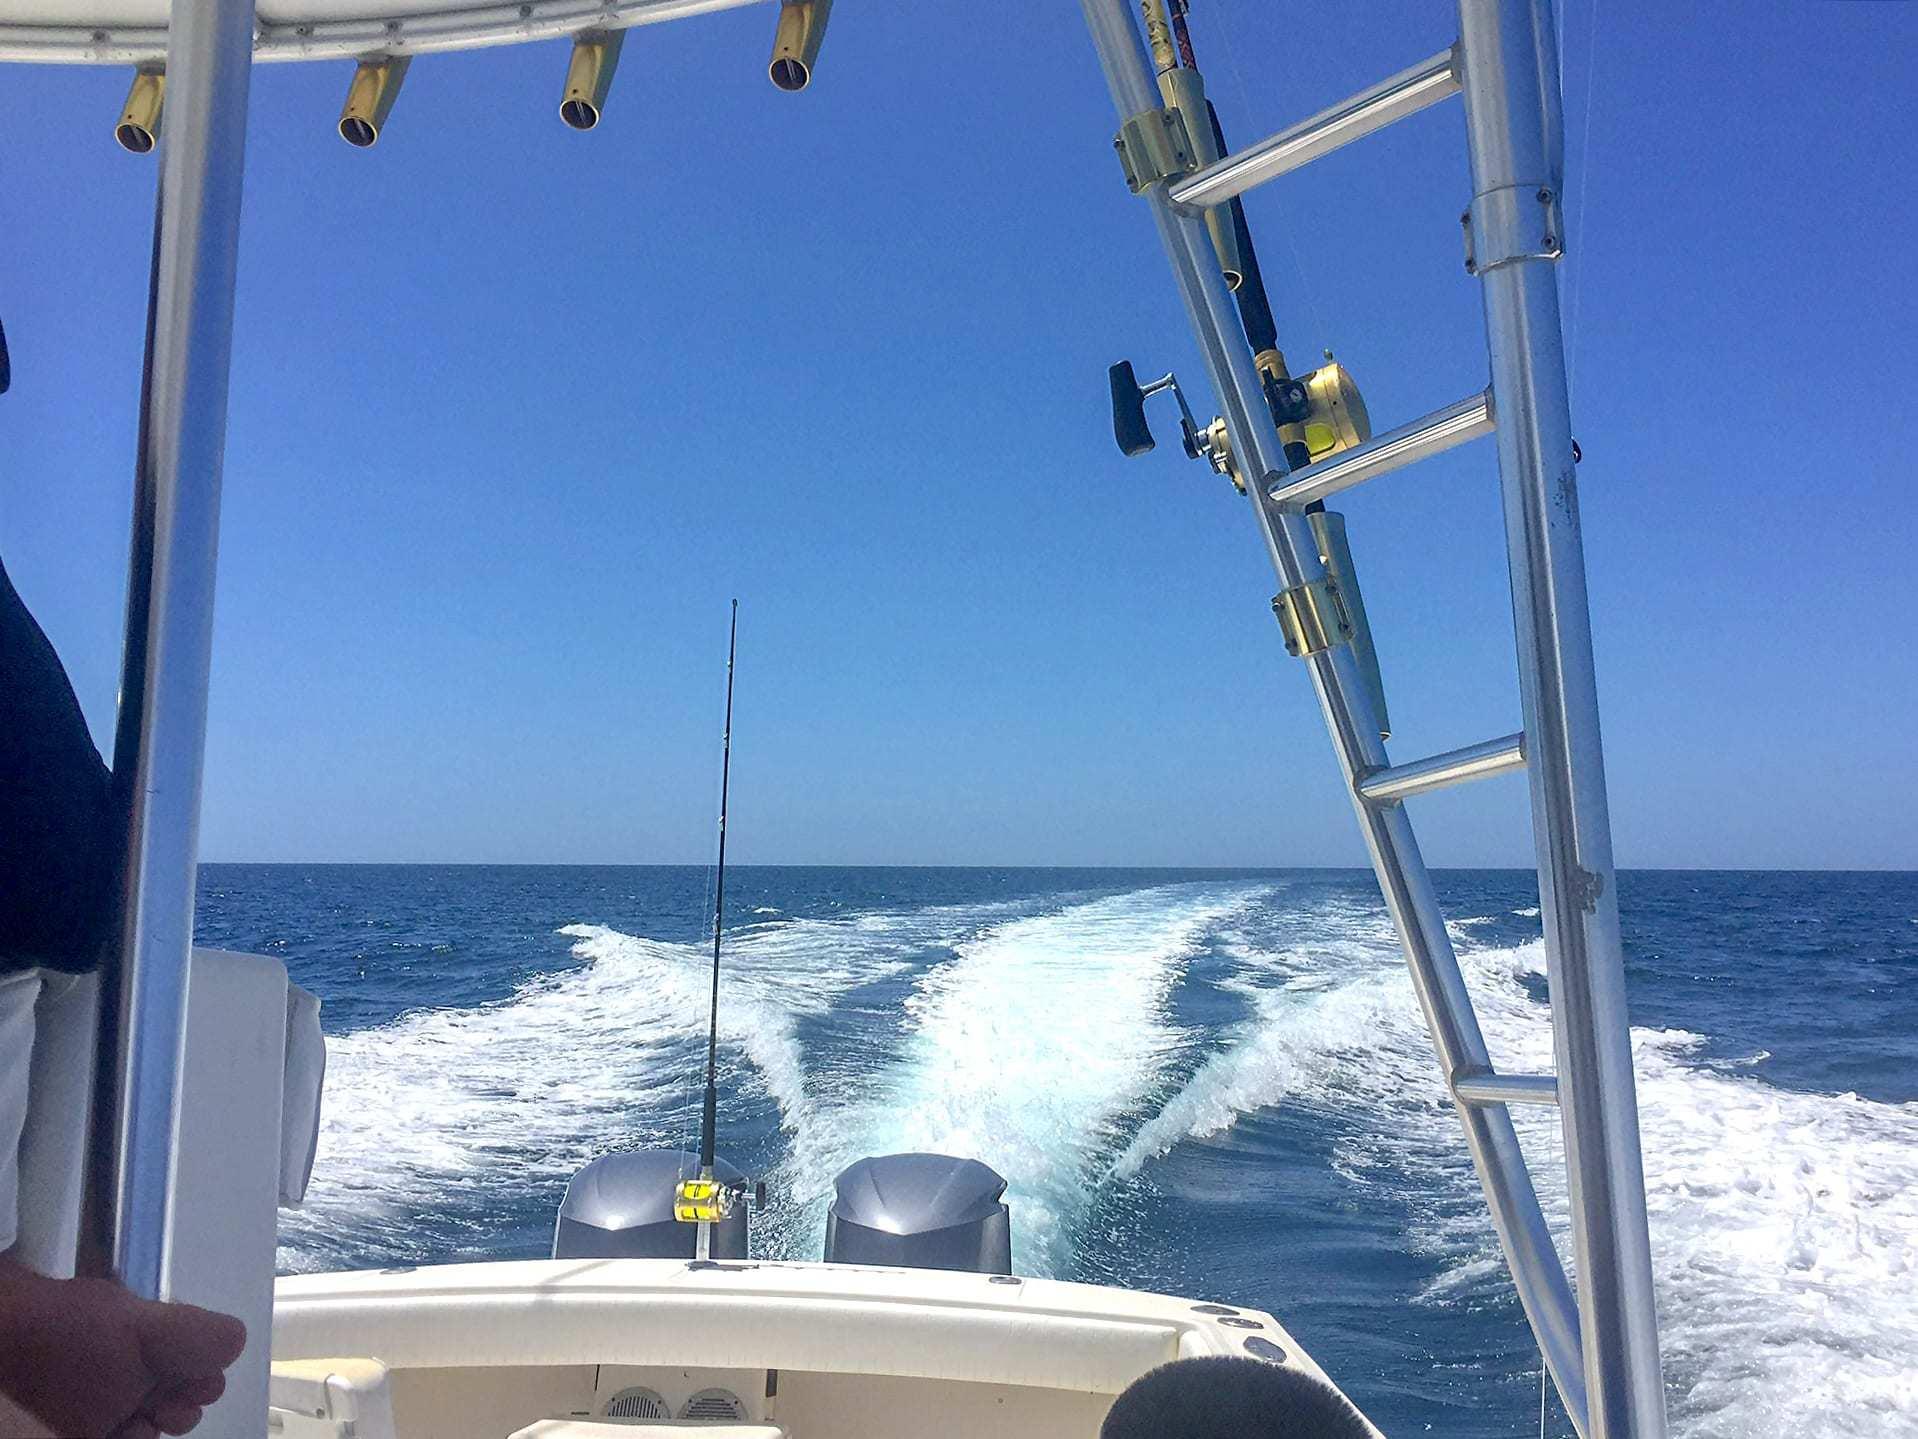 Wasabi Fishing - The Boat